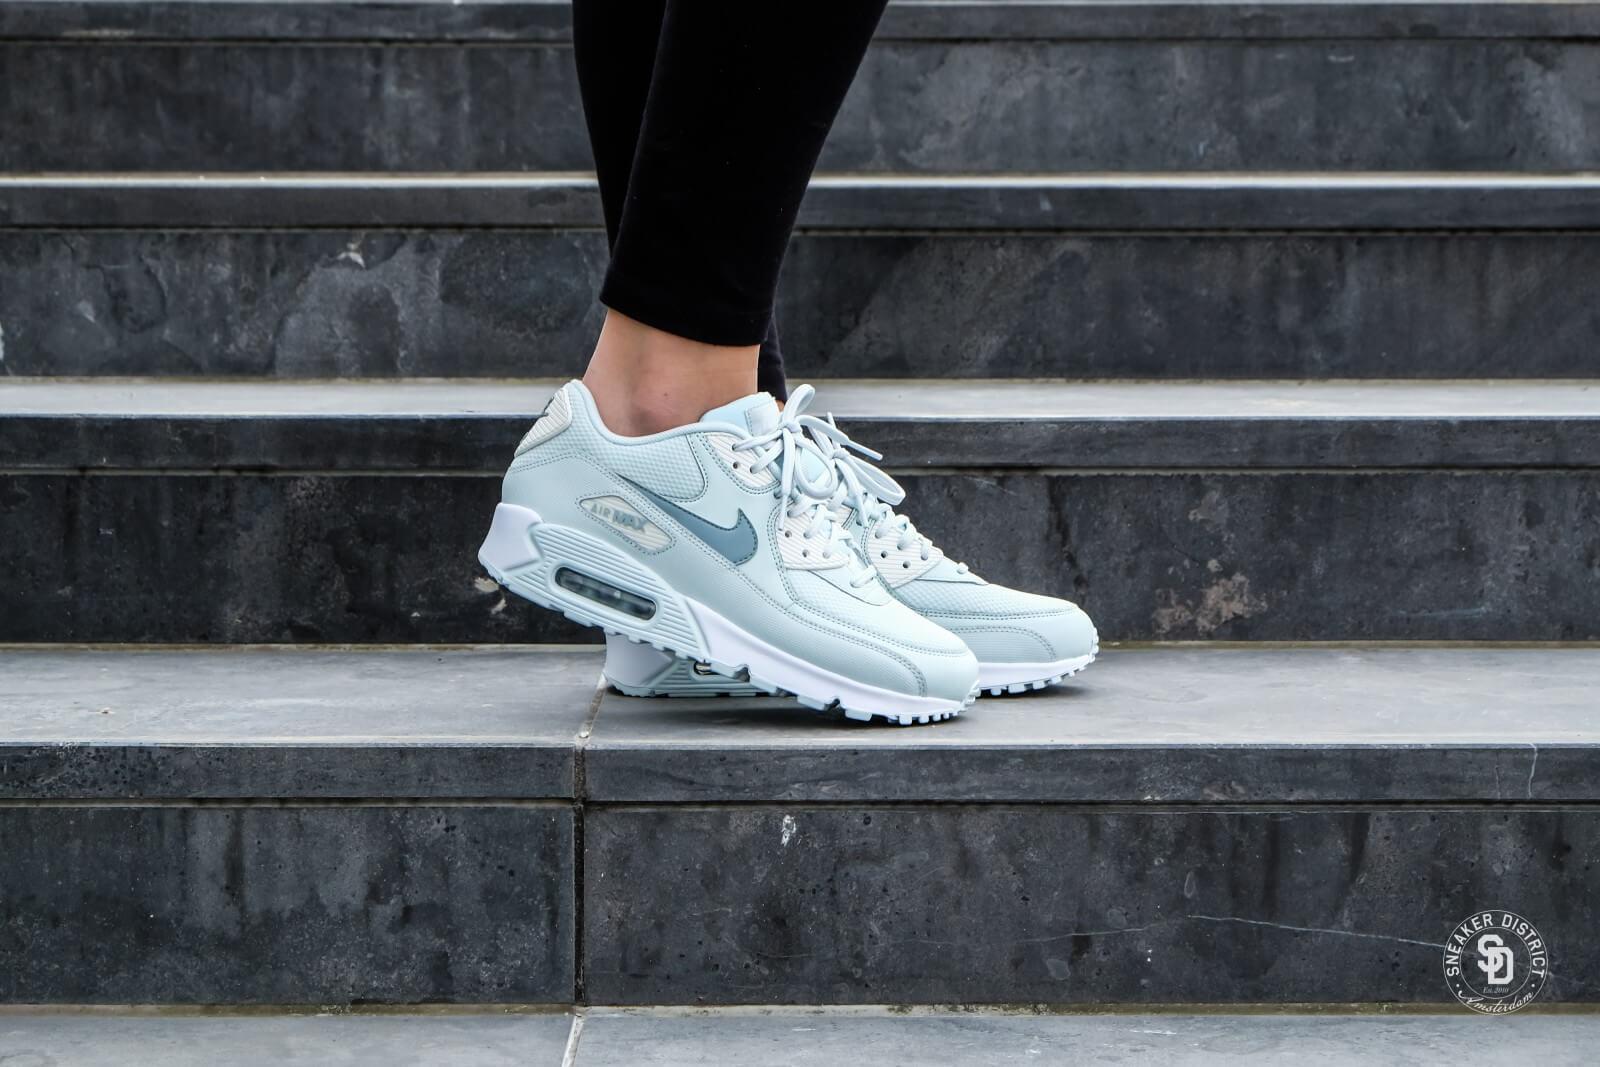 Nike Women's Air Max 90 Barely Grey/Light Pumice